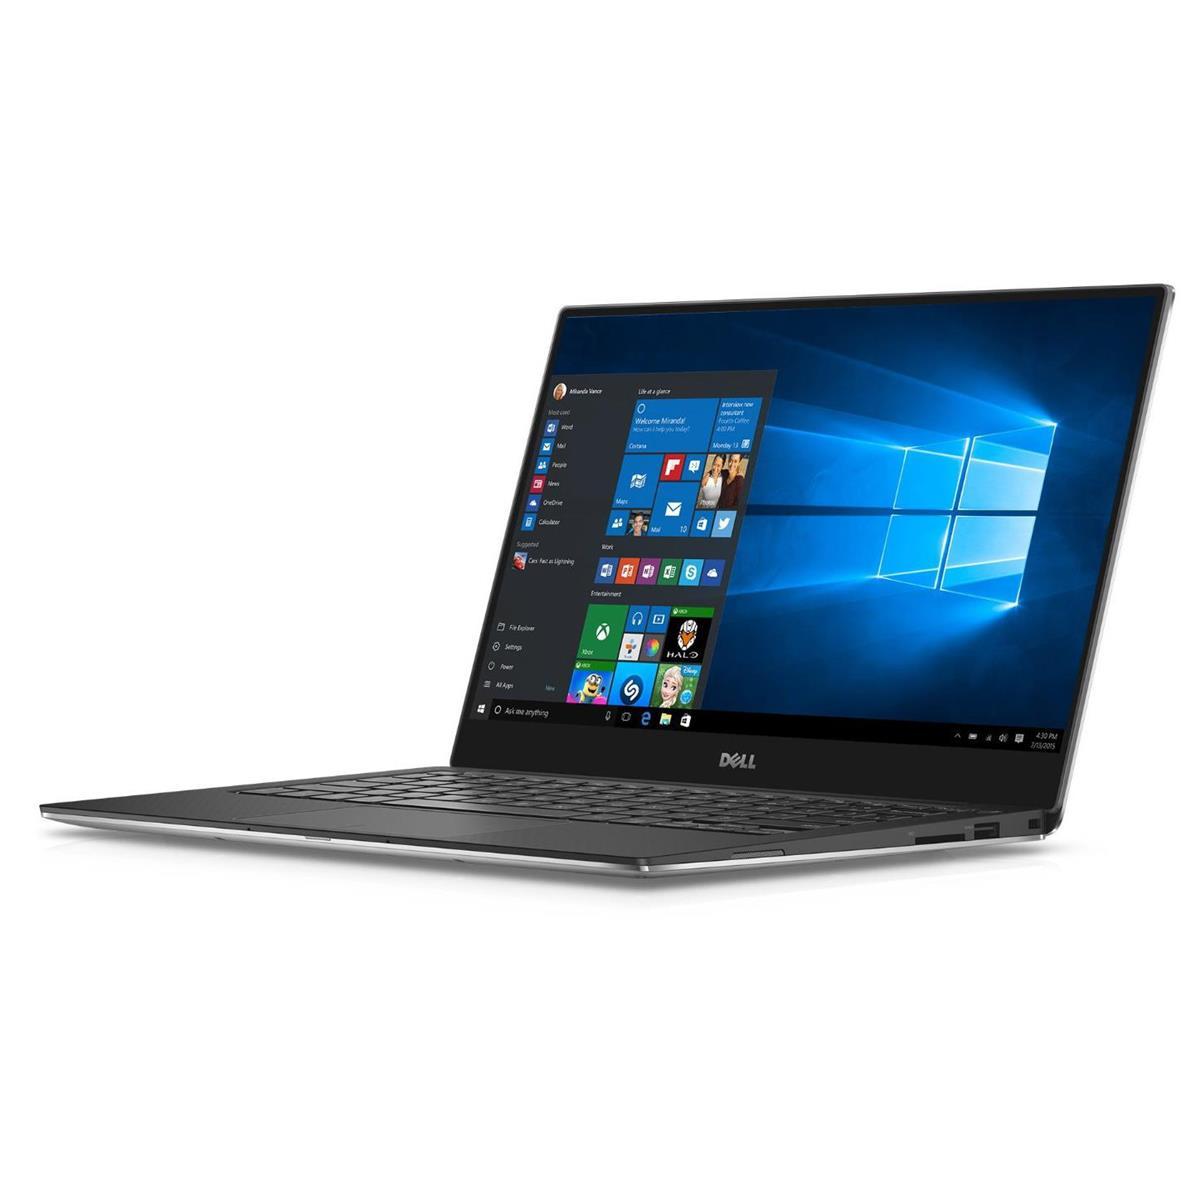 "Dell XPS 13 9360 Laptop: i7-7500U, 13.3"" 3200x1800, 256GB PCIe SSD, Intel HD 620 $1099 + Free Shipping"